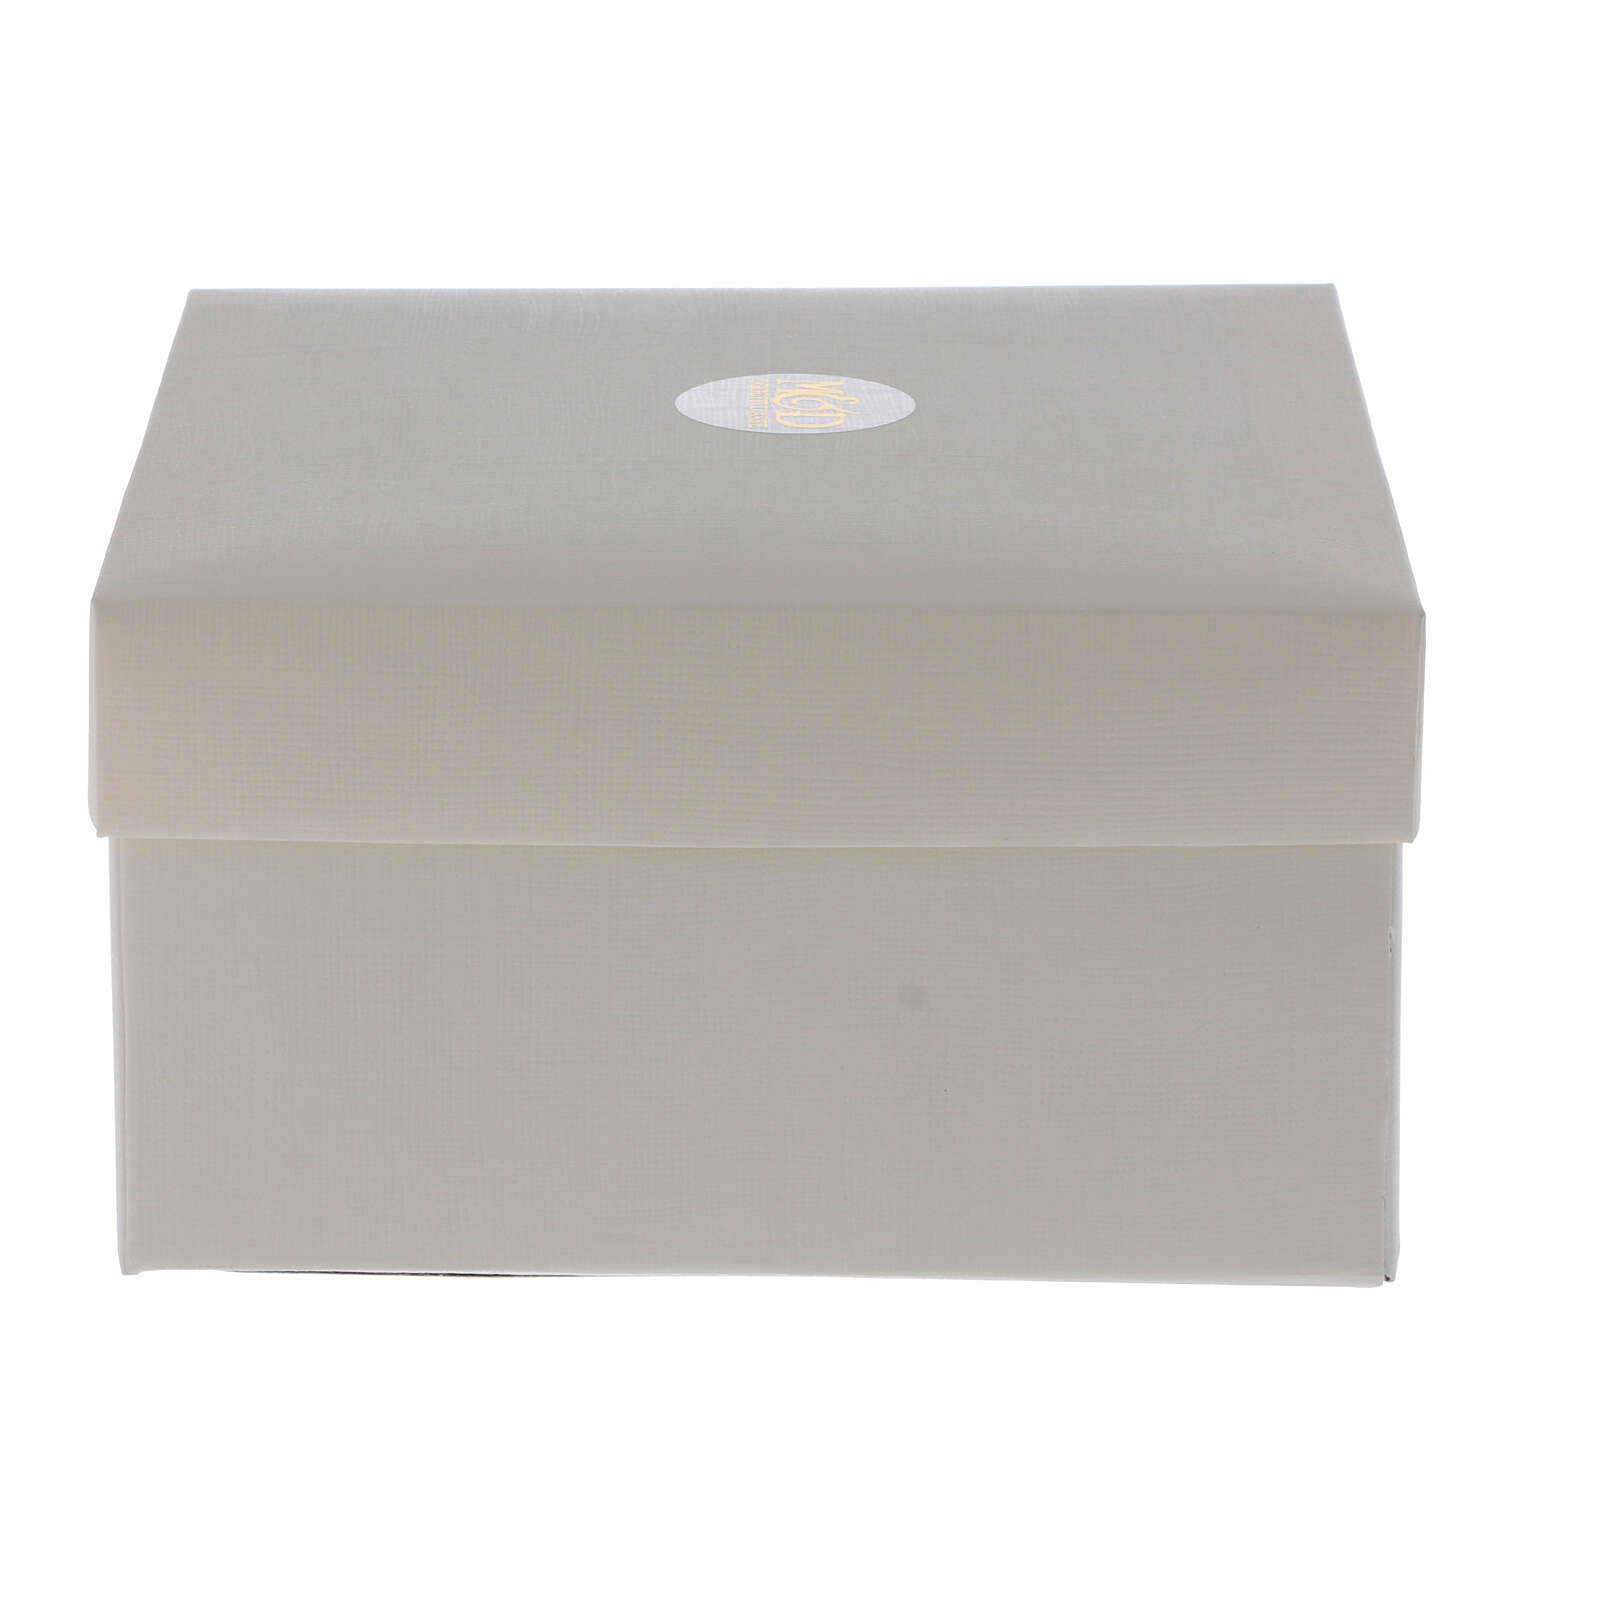 Recuerdo 50 aniversario lámina plata 17x17 cm 3